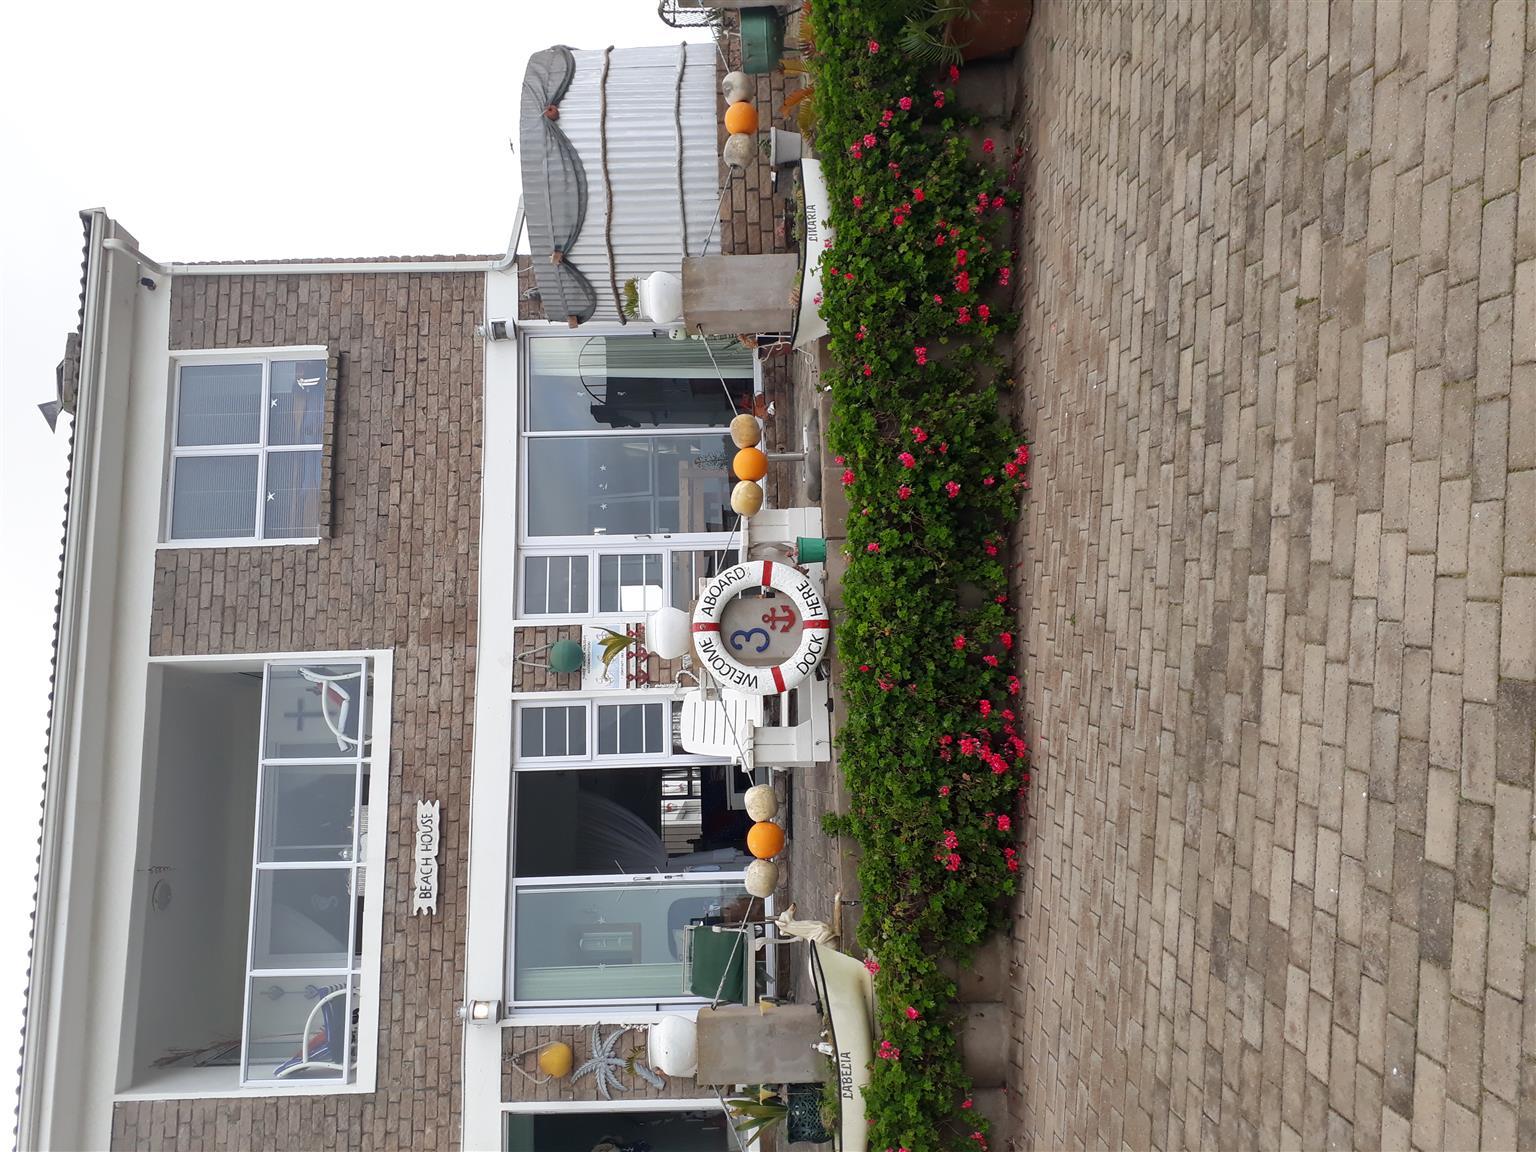 3 Anchor s/c accommodation